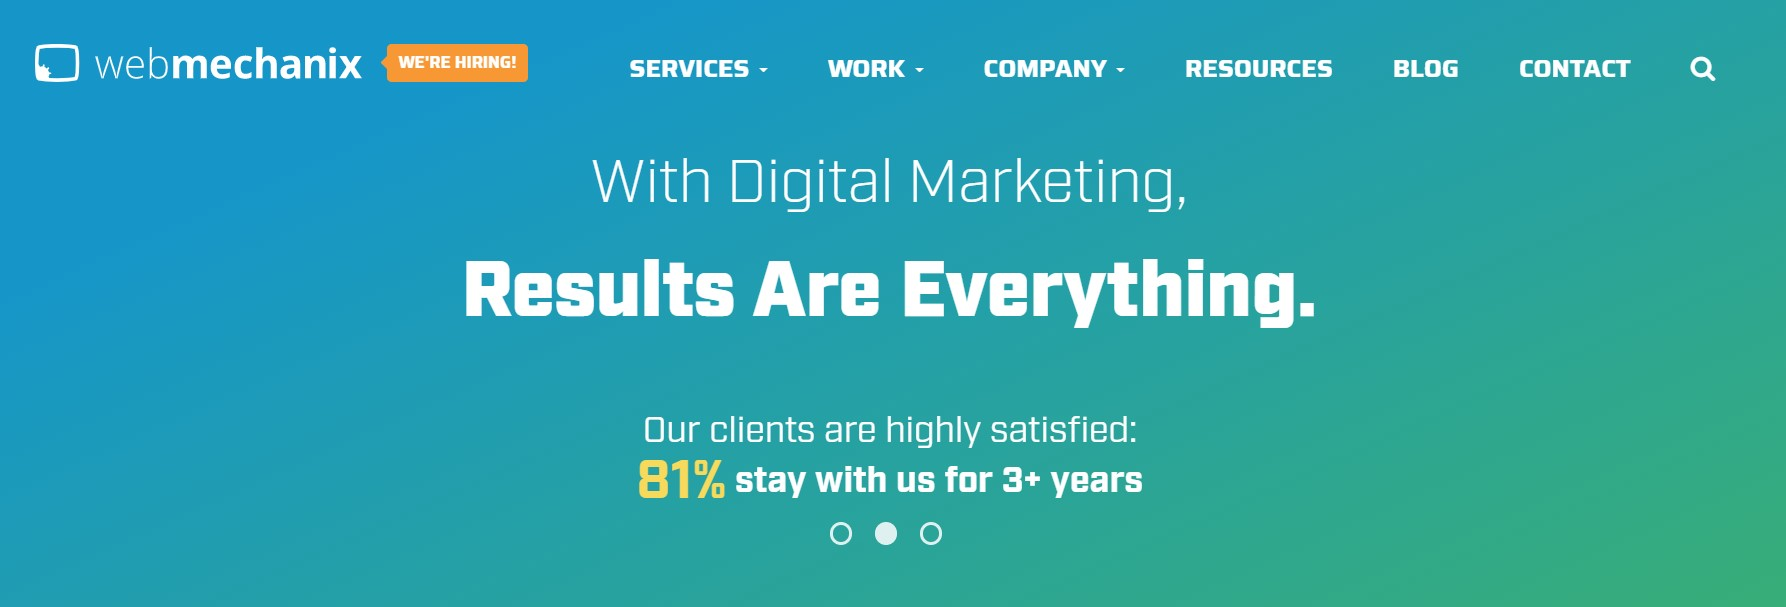 webmechanix-top-digital-marketing-agencies